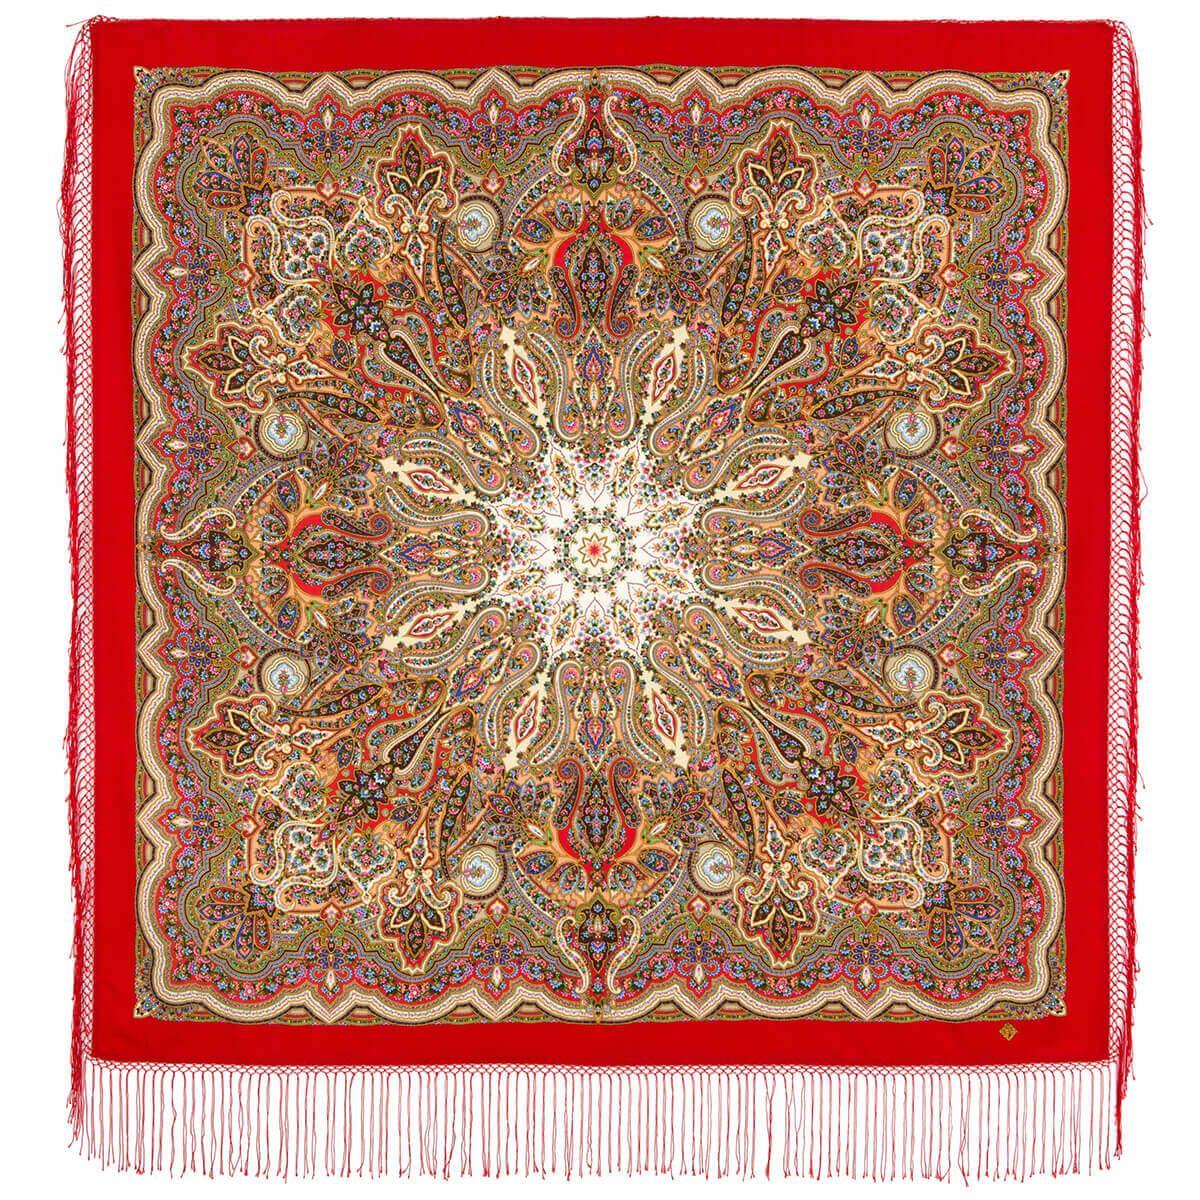 Павлопосадский платок Сказочница 1763-7 (135х135 см)